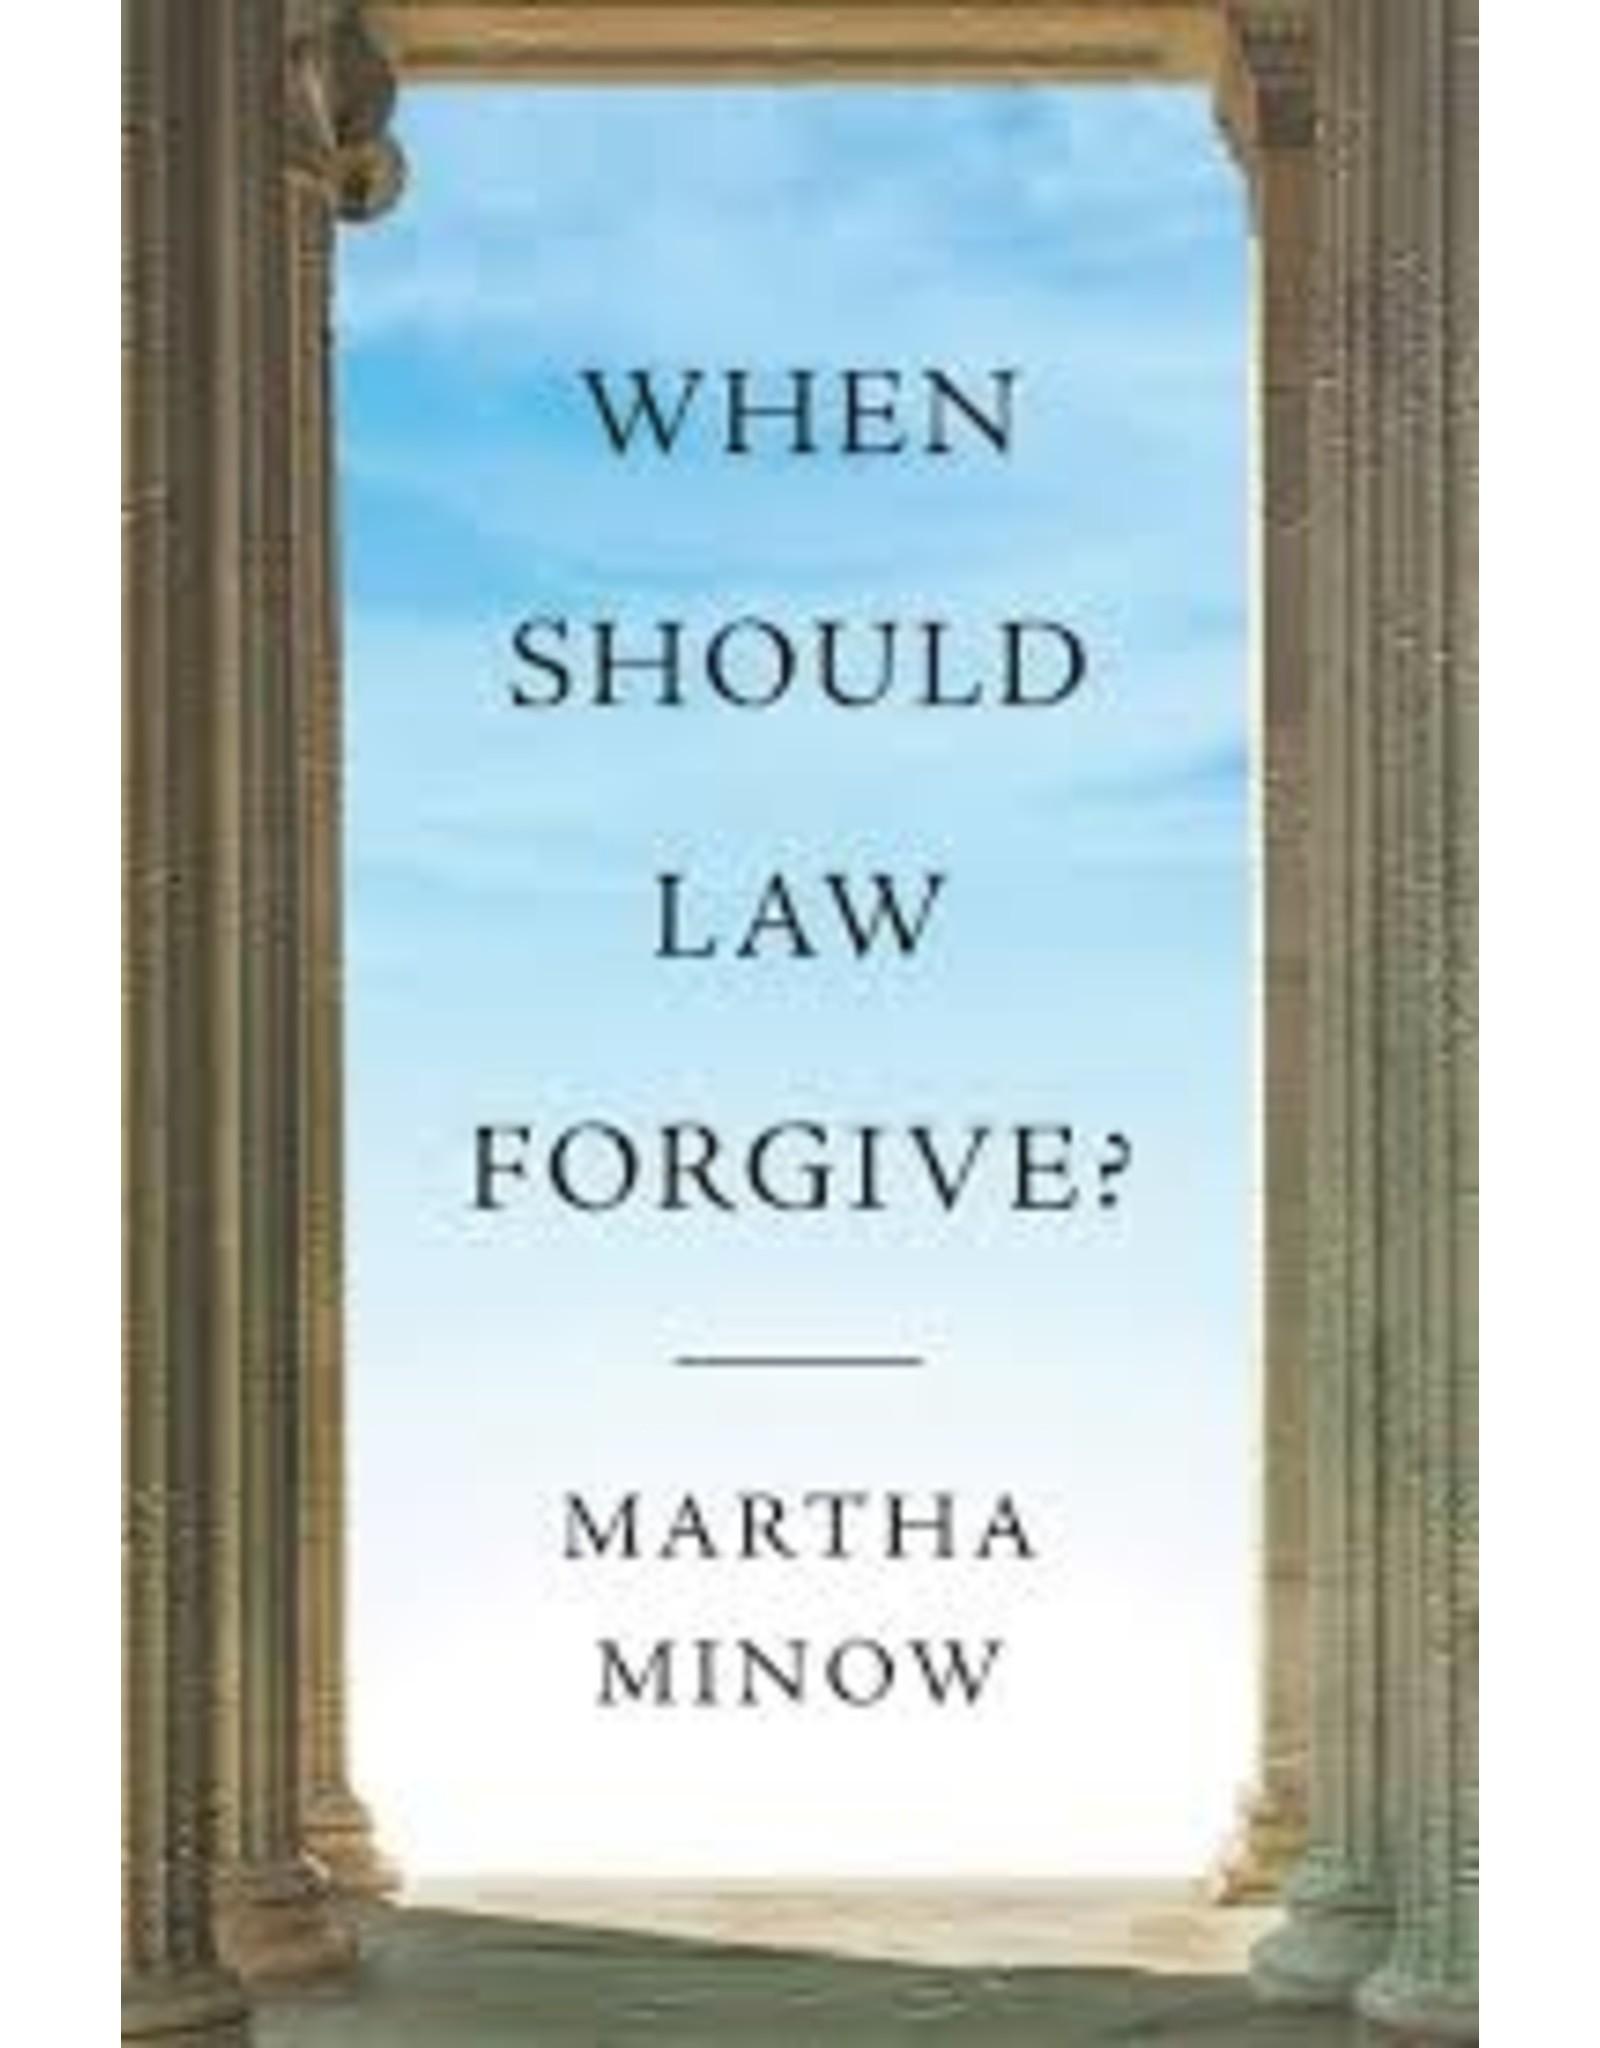 Books When Should Law Forgive? Martha Minow